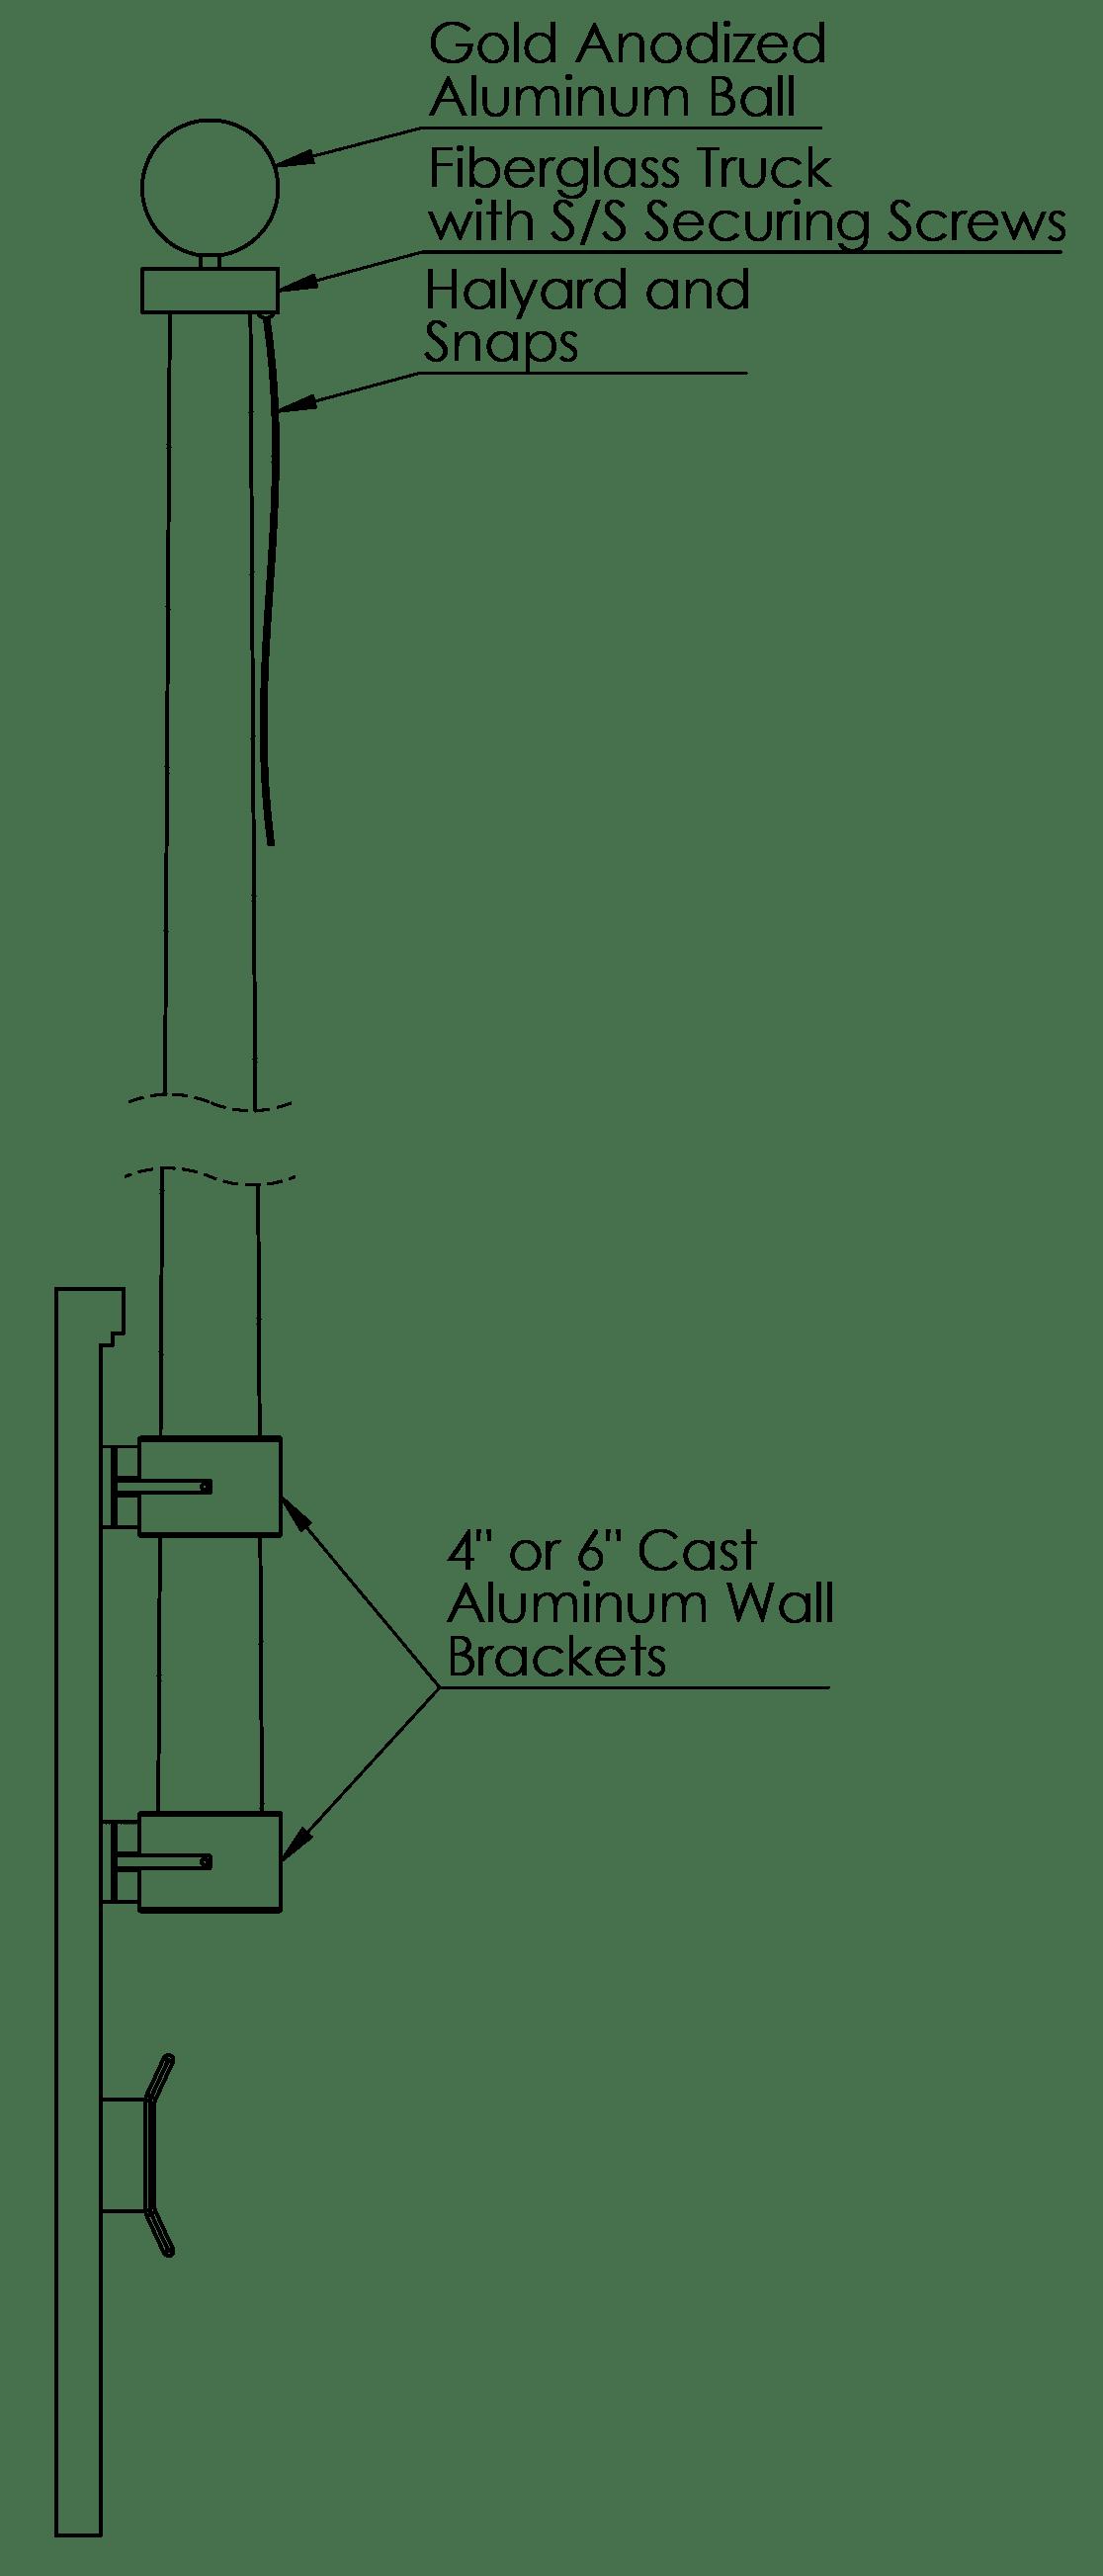 Geometric Orange and white wall hanging dish iparm\u00fcveszeti vallalat